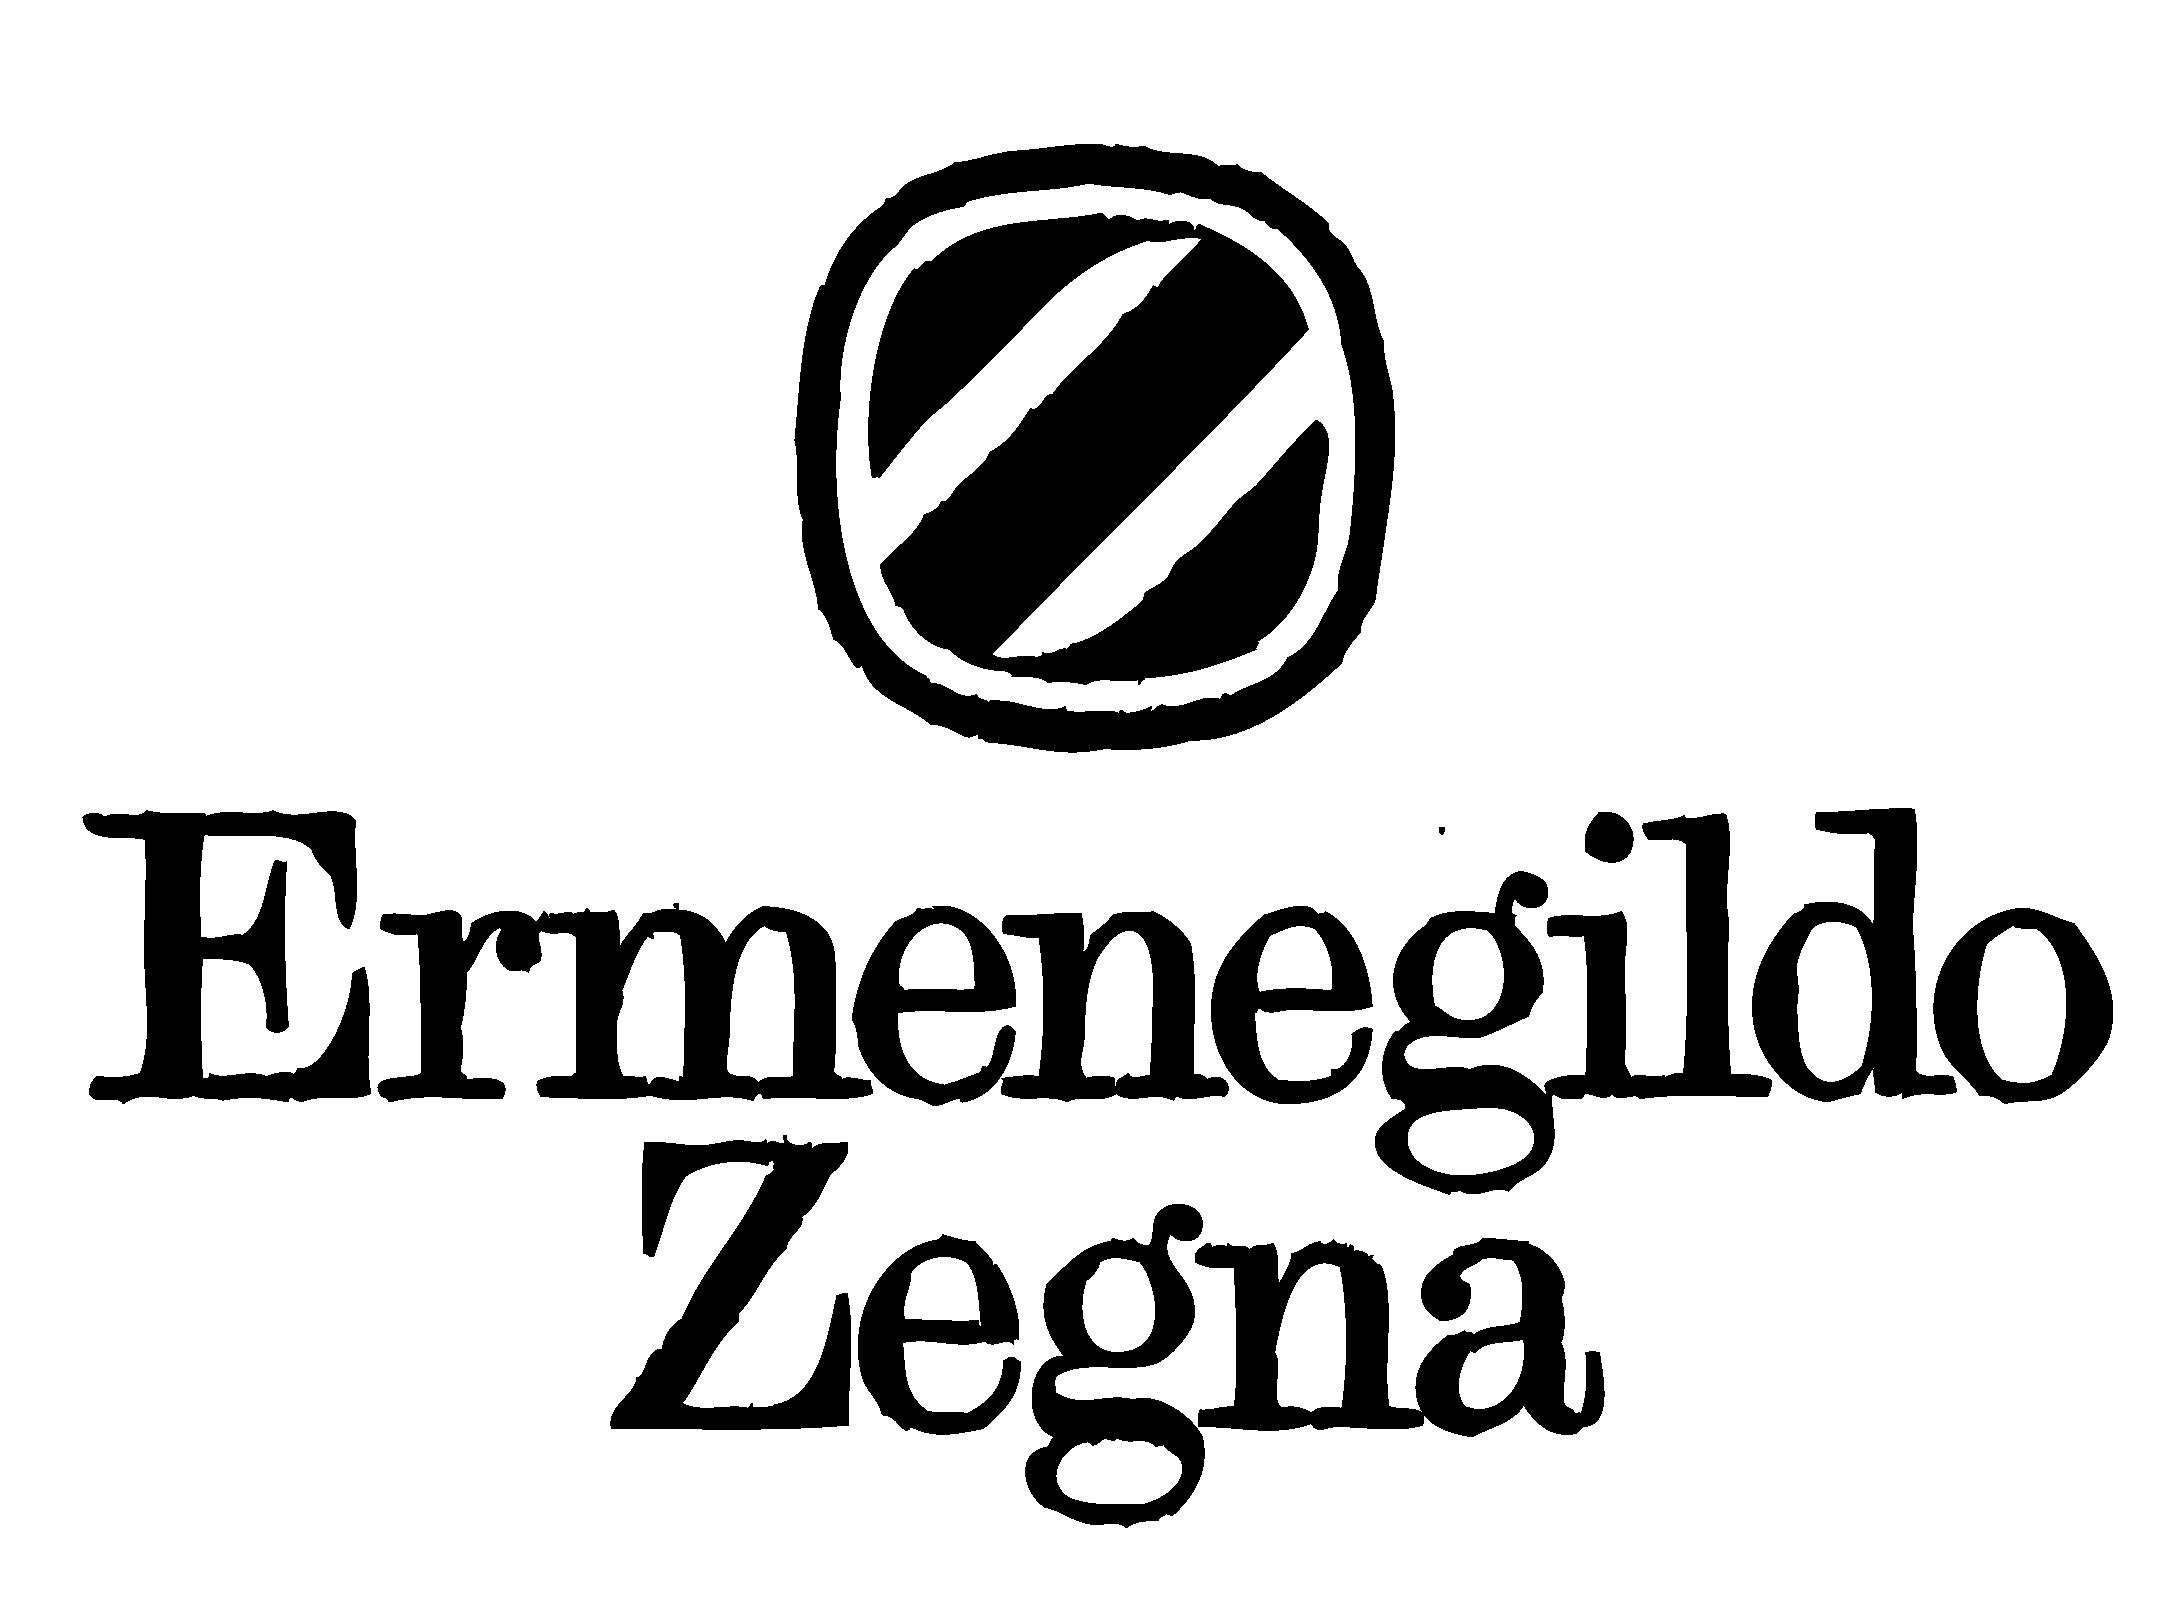 Ermenegildo_Zegna_logo-01.png